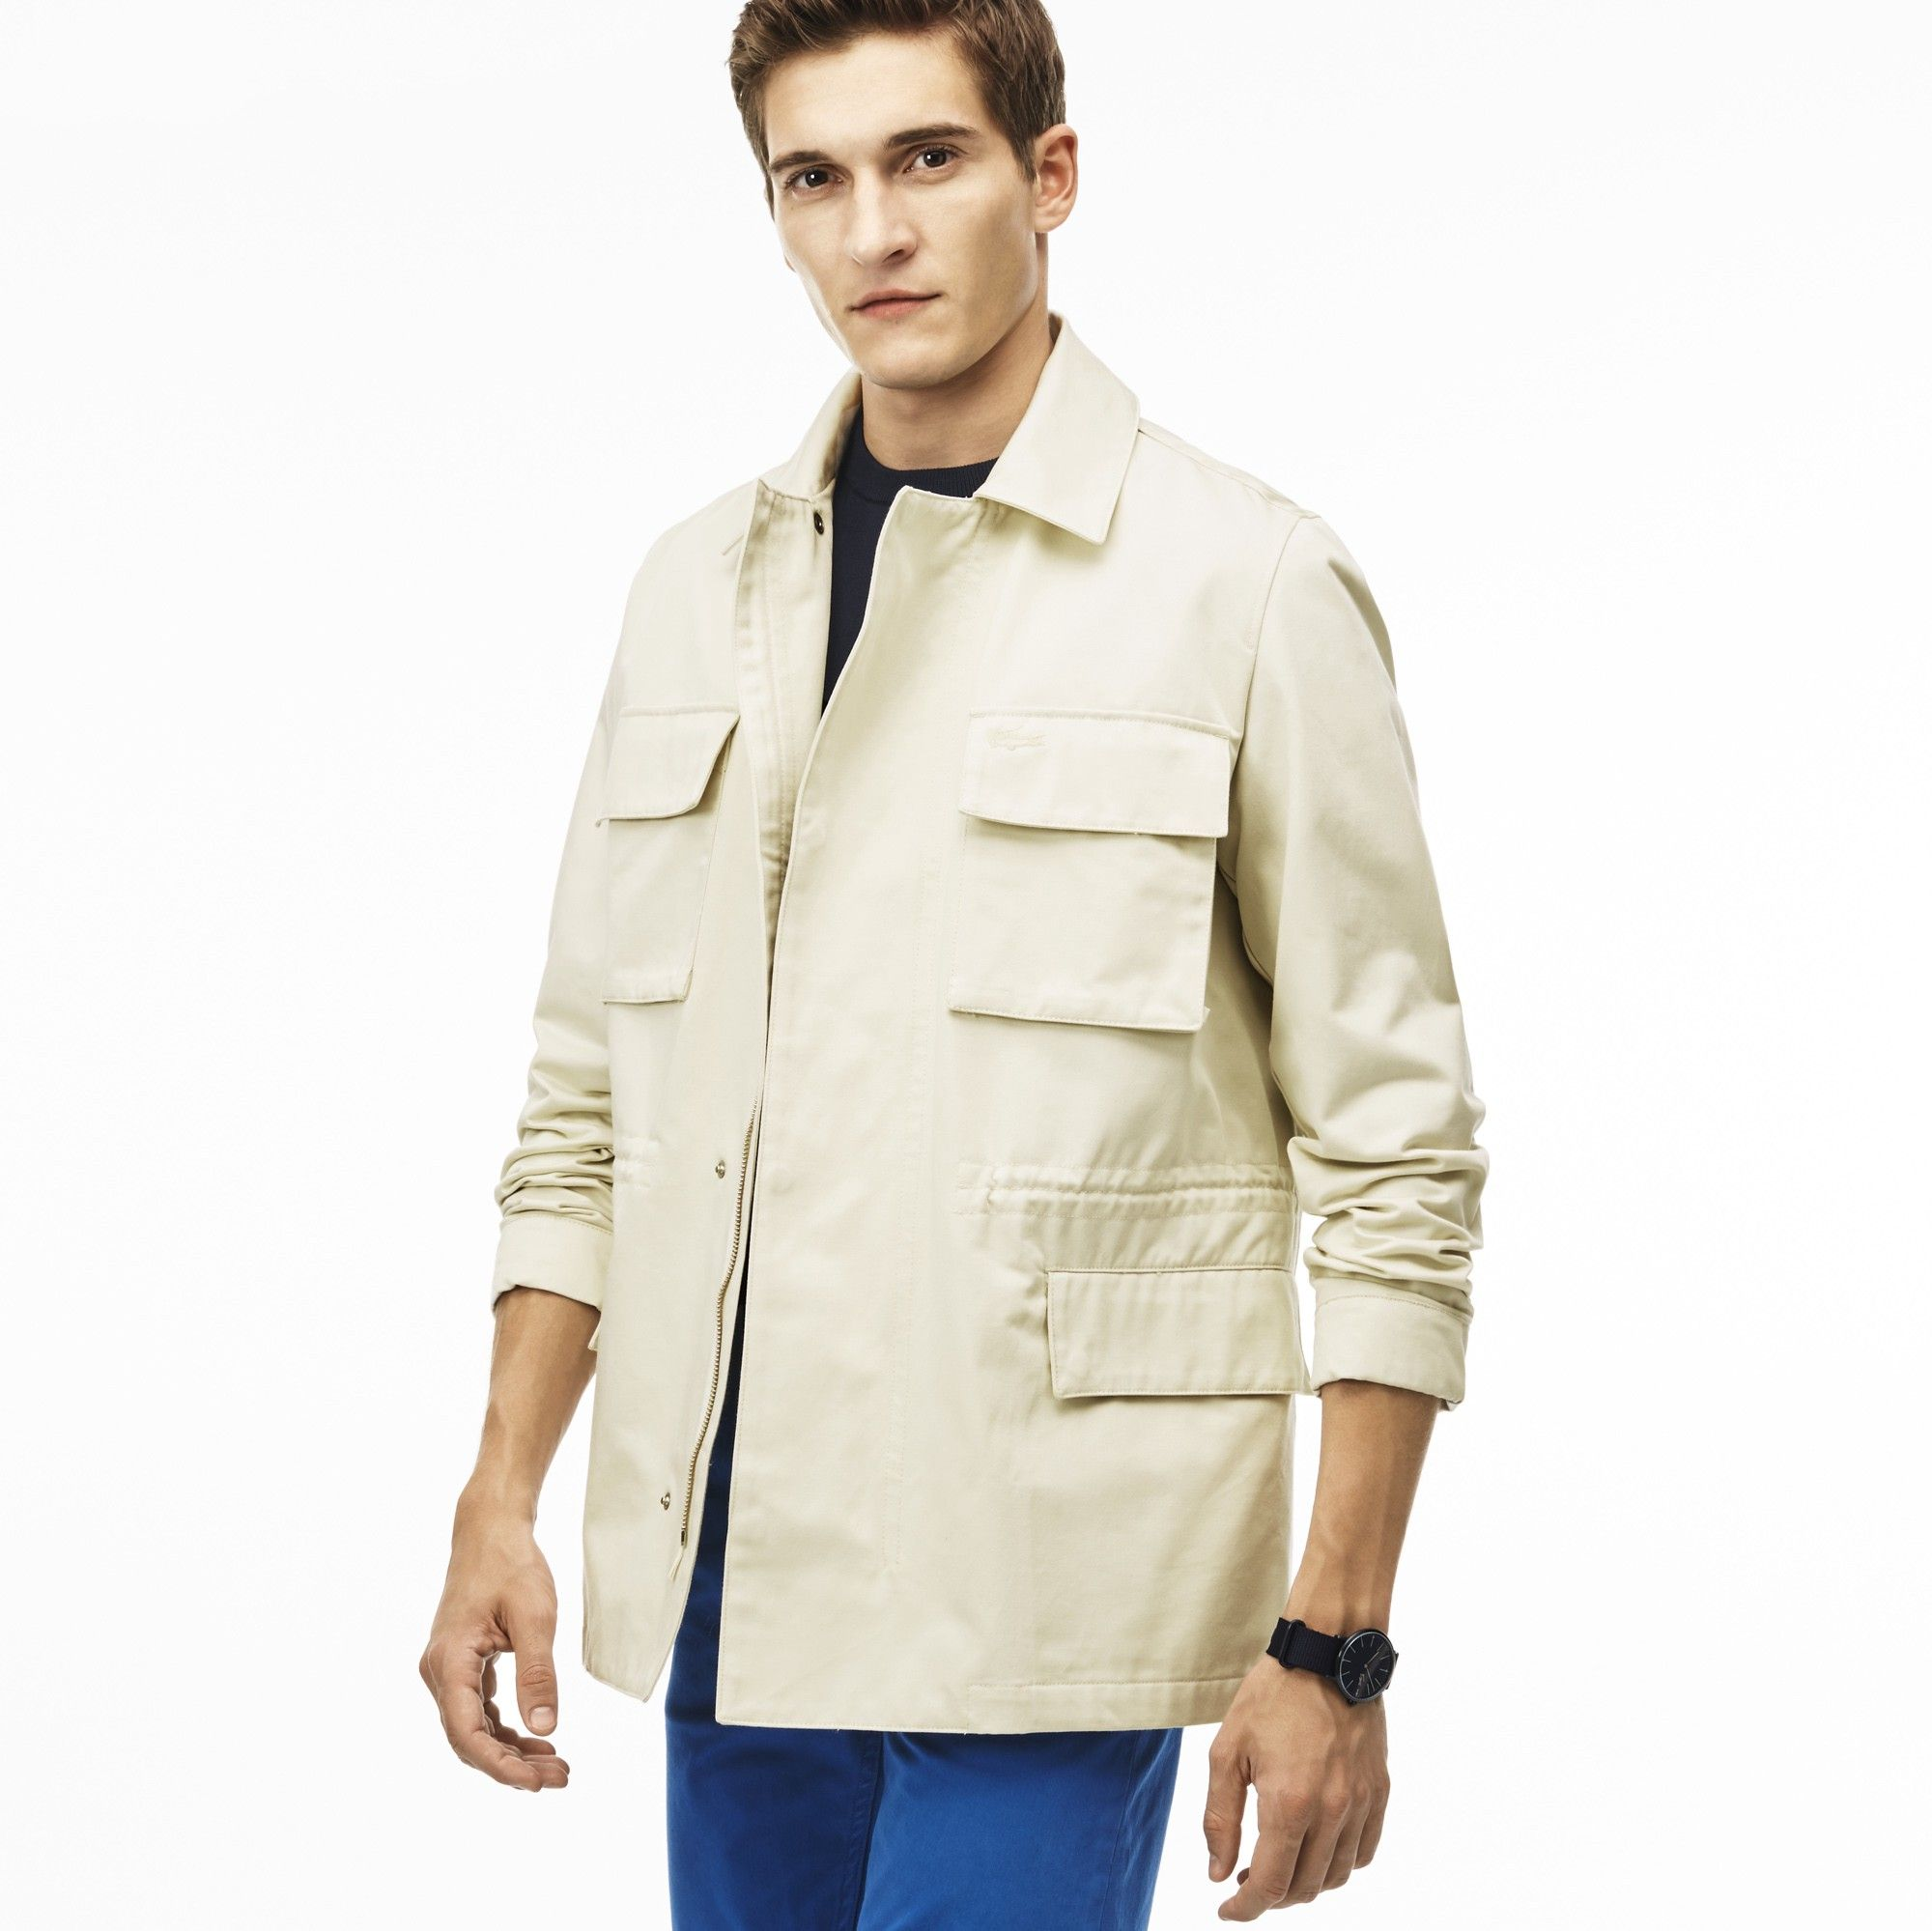 a95541e9b18 LACOSTE Men s Gabardine Various Pockets Zippered Jacket - MARZIPAN.  lacoste   cloth